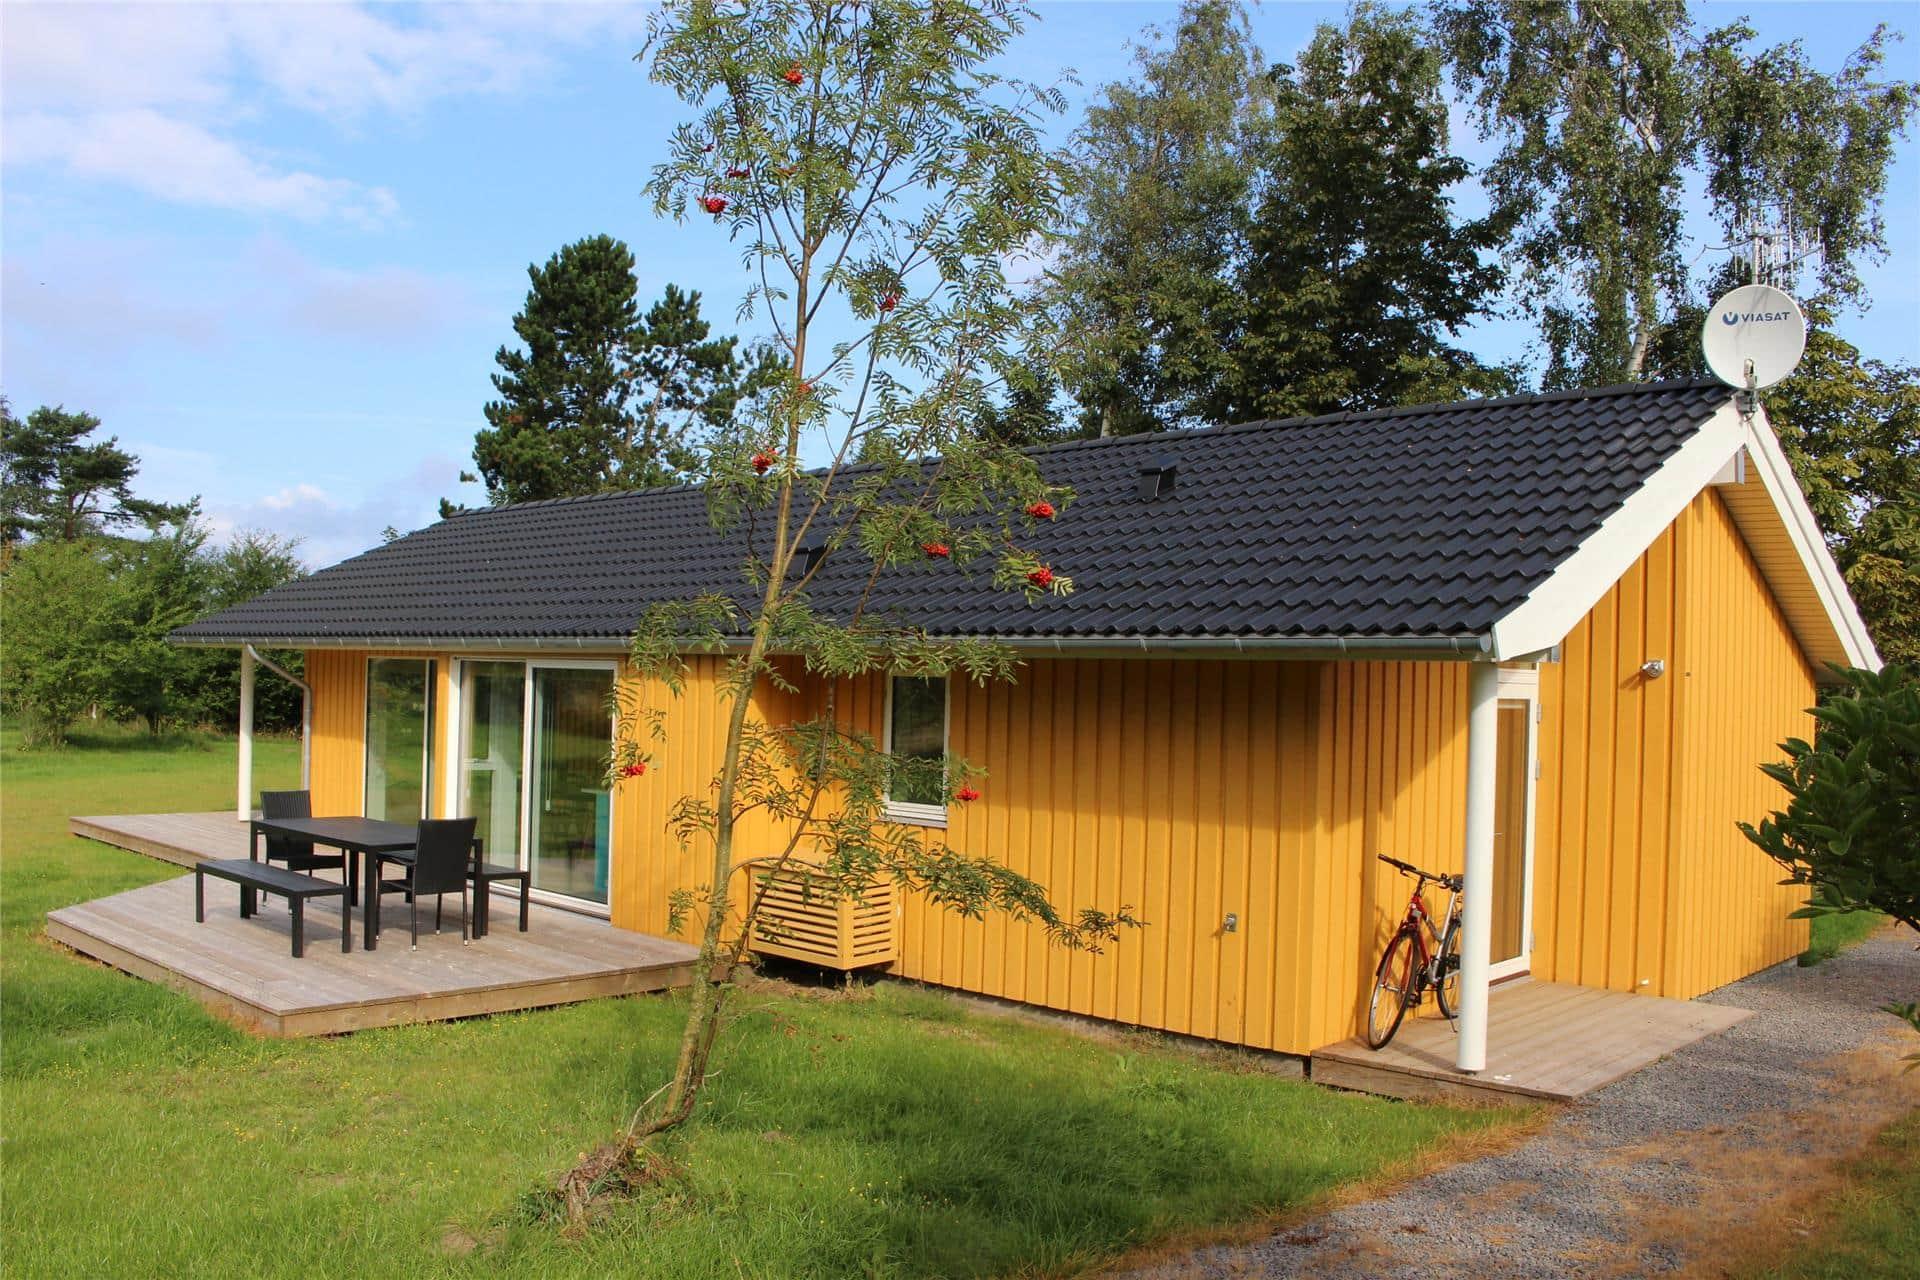 Bild 1-17 Ferienhaus 16631, Rørmosen 12, DK - 4540 Fårevejle